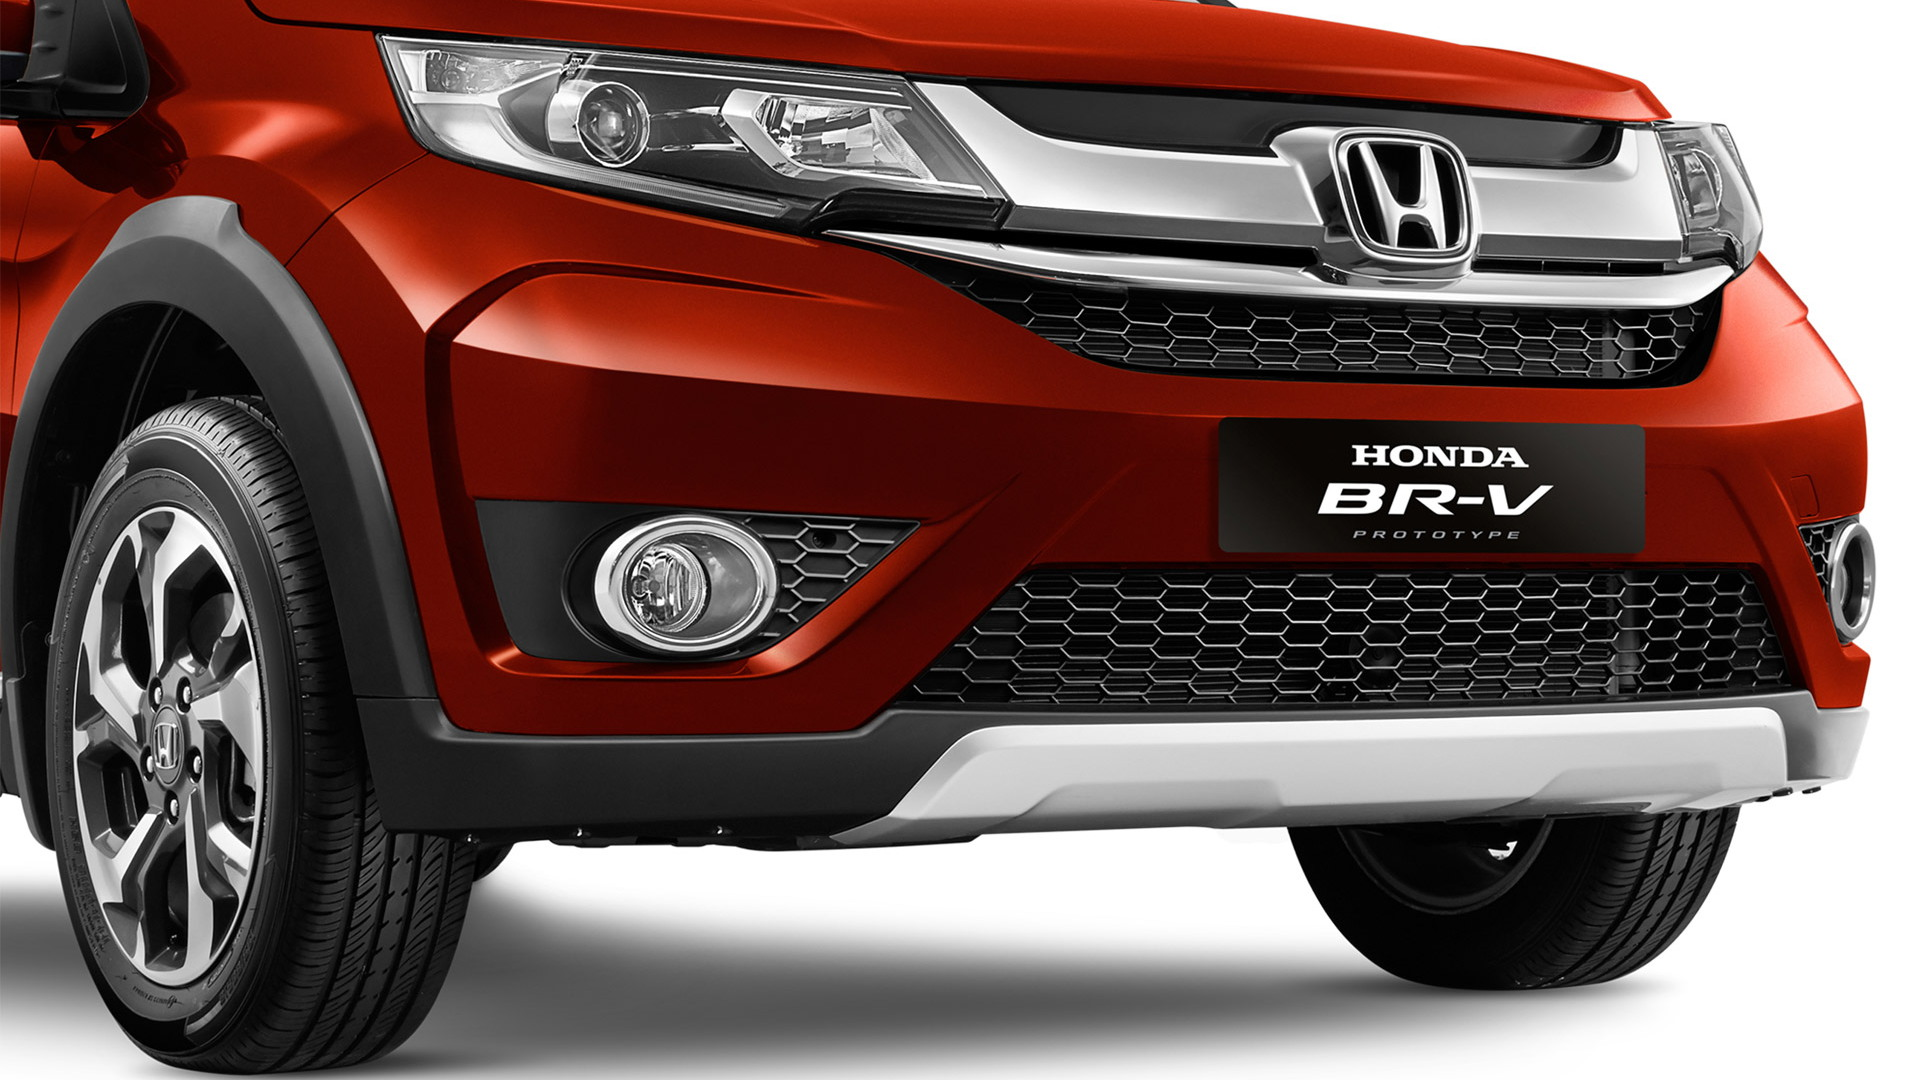 Honda BR-V prototype, 2015 Indonesian Auto Show